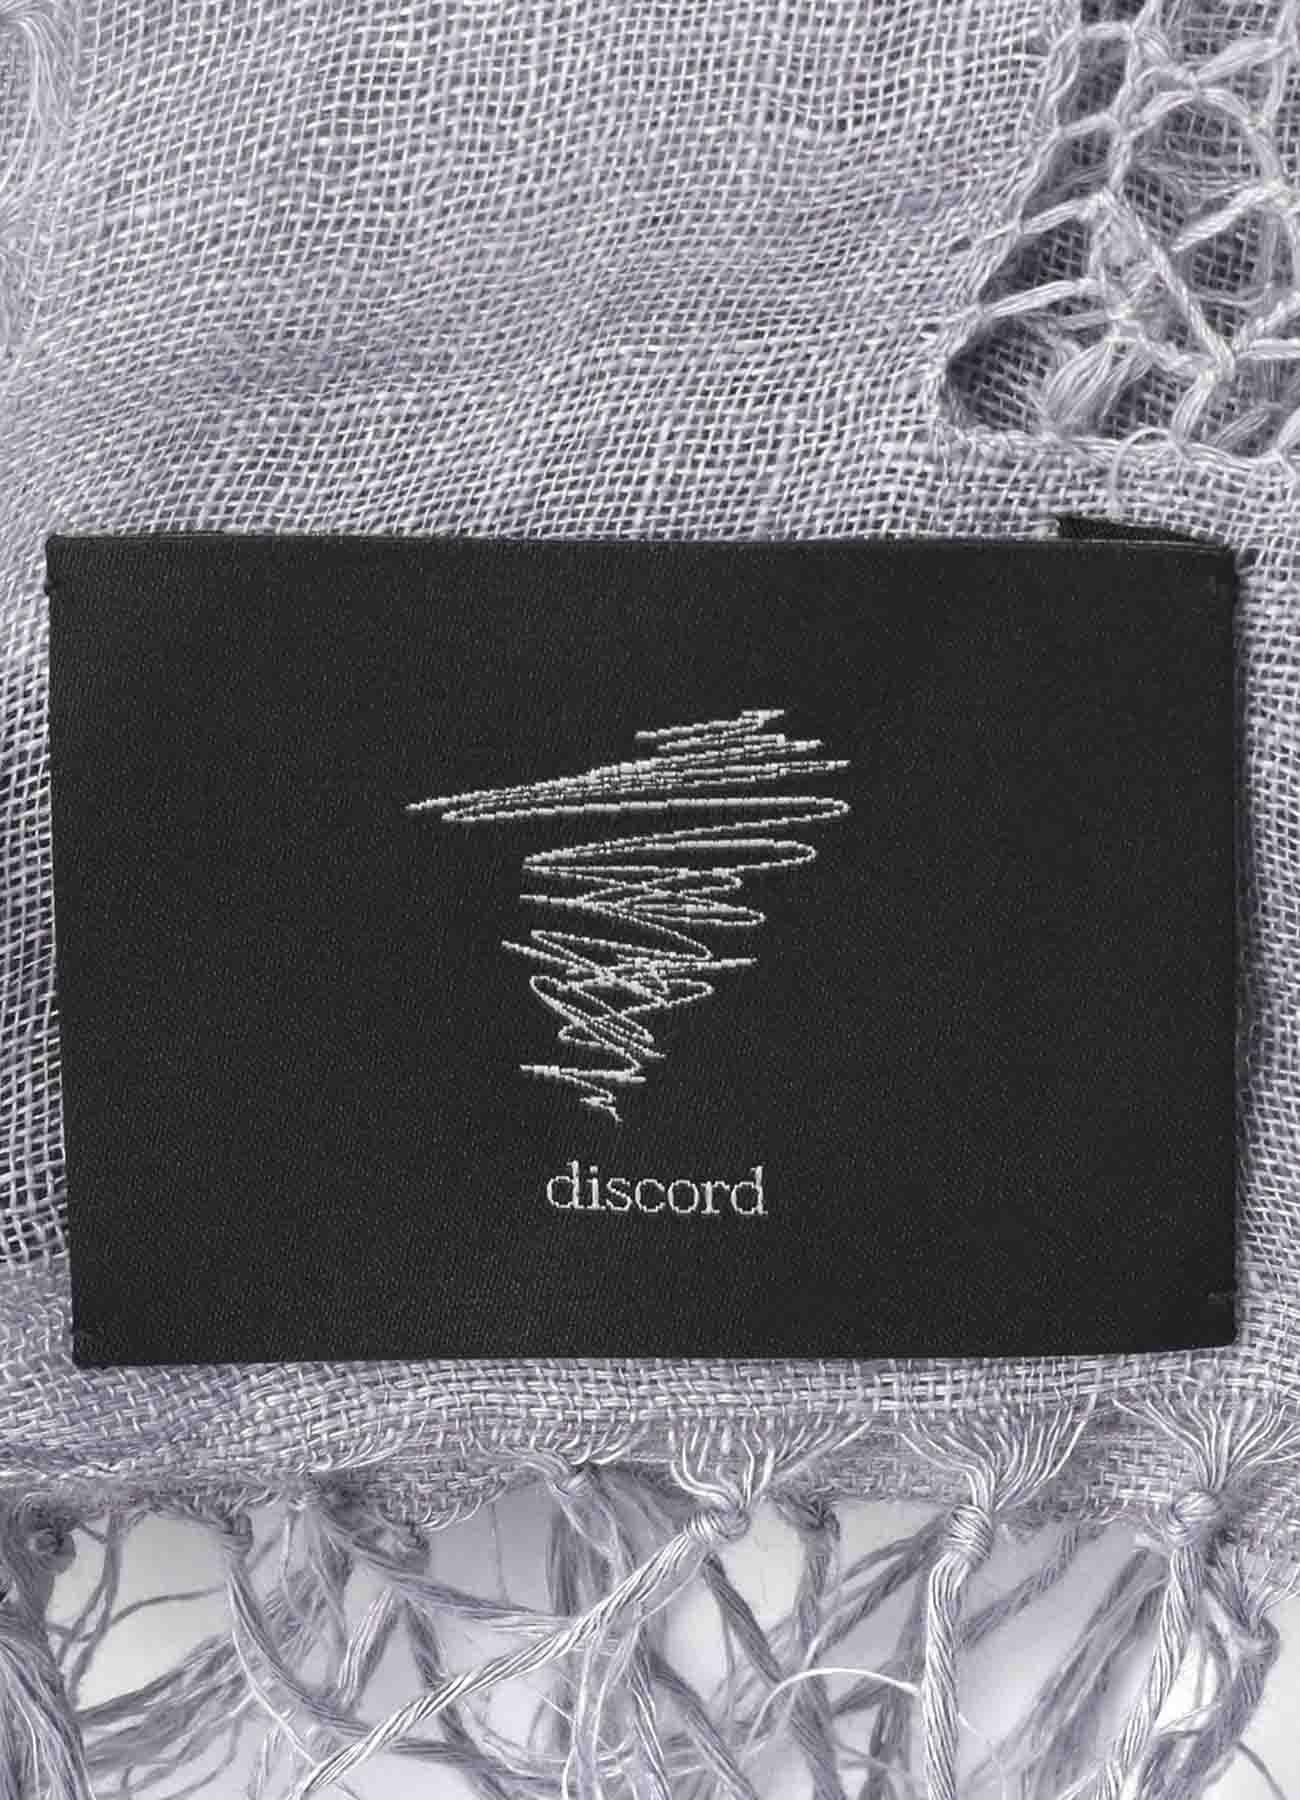 Khadi围巾 -discord-A